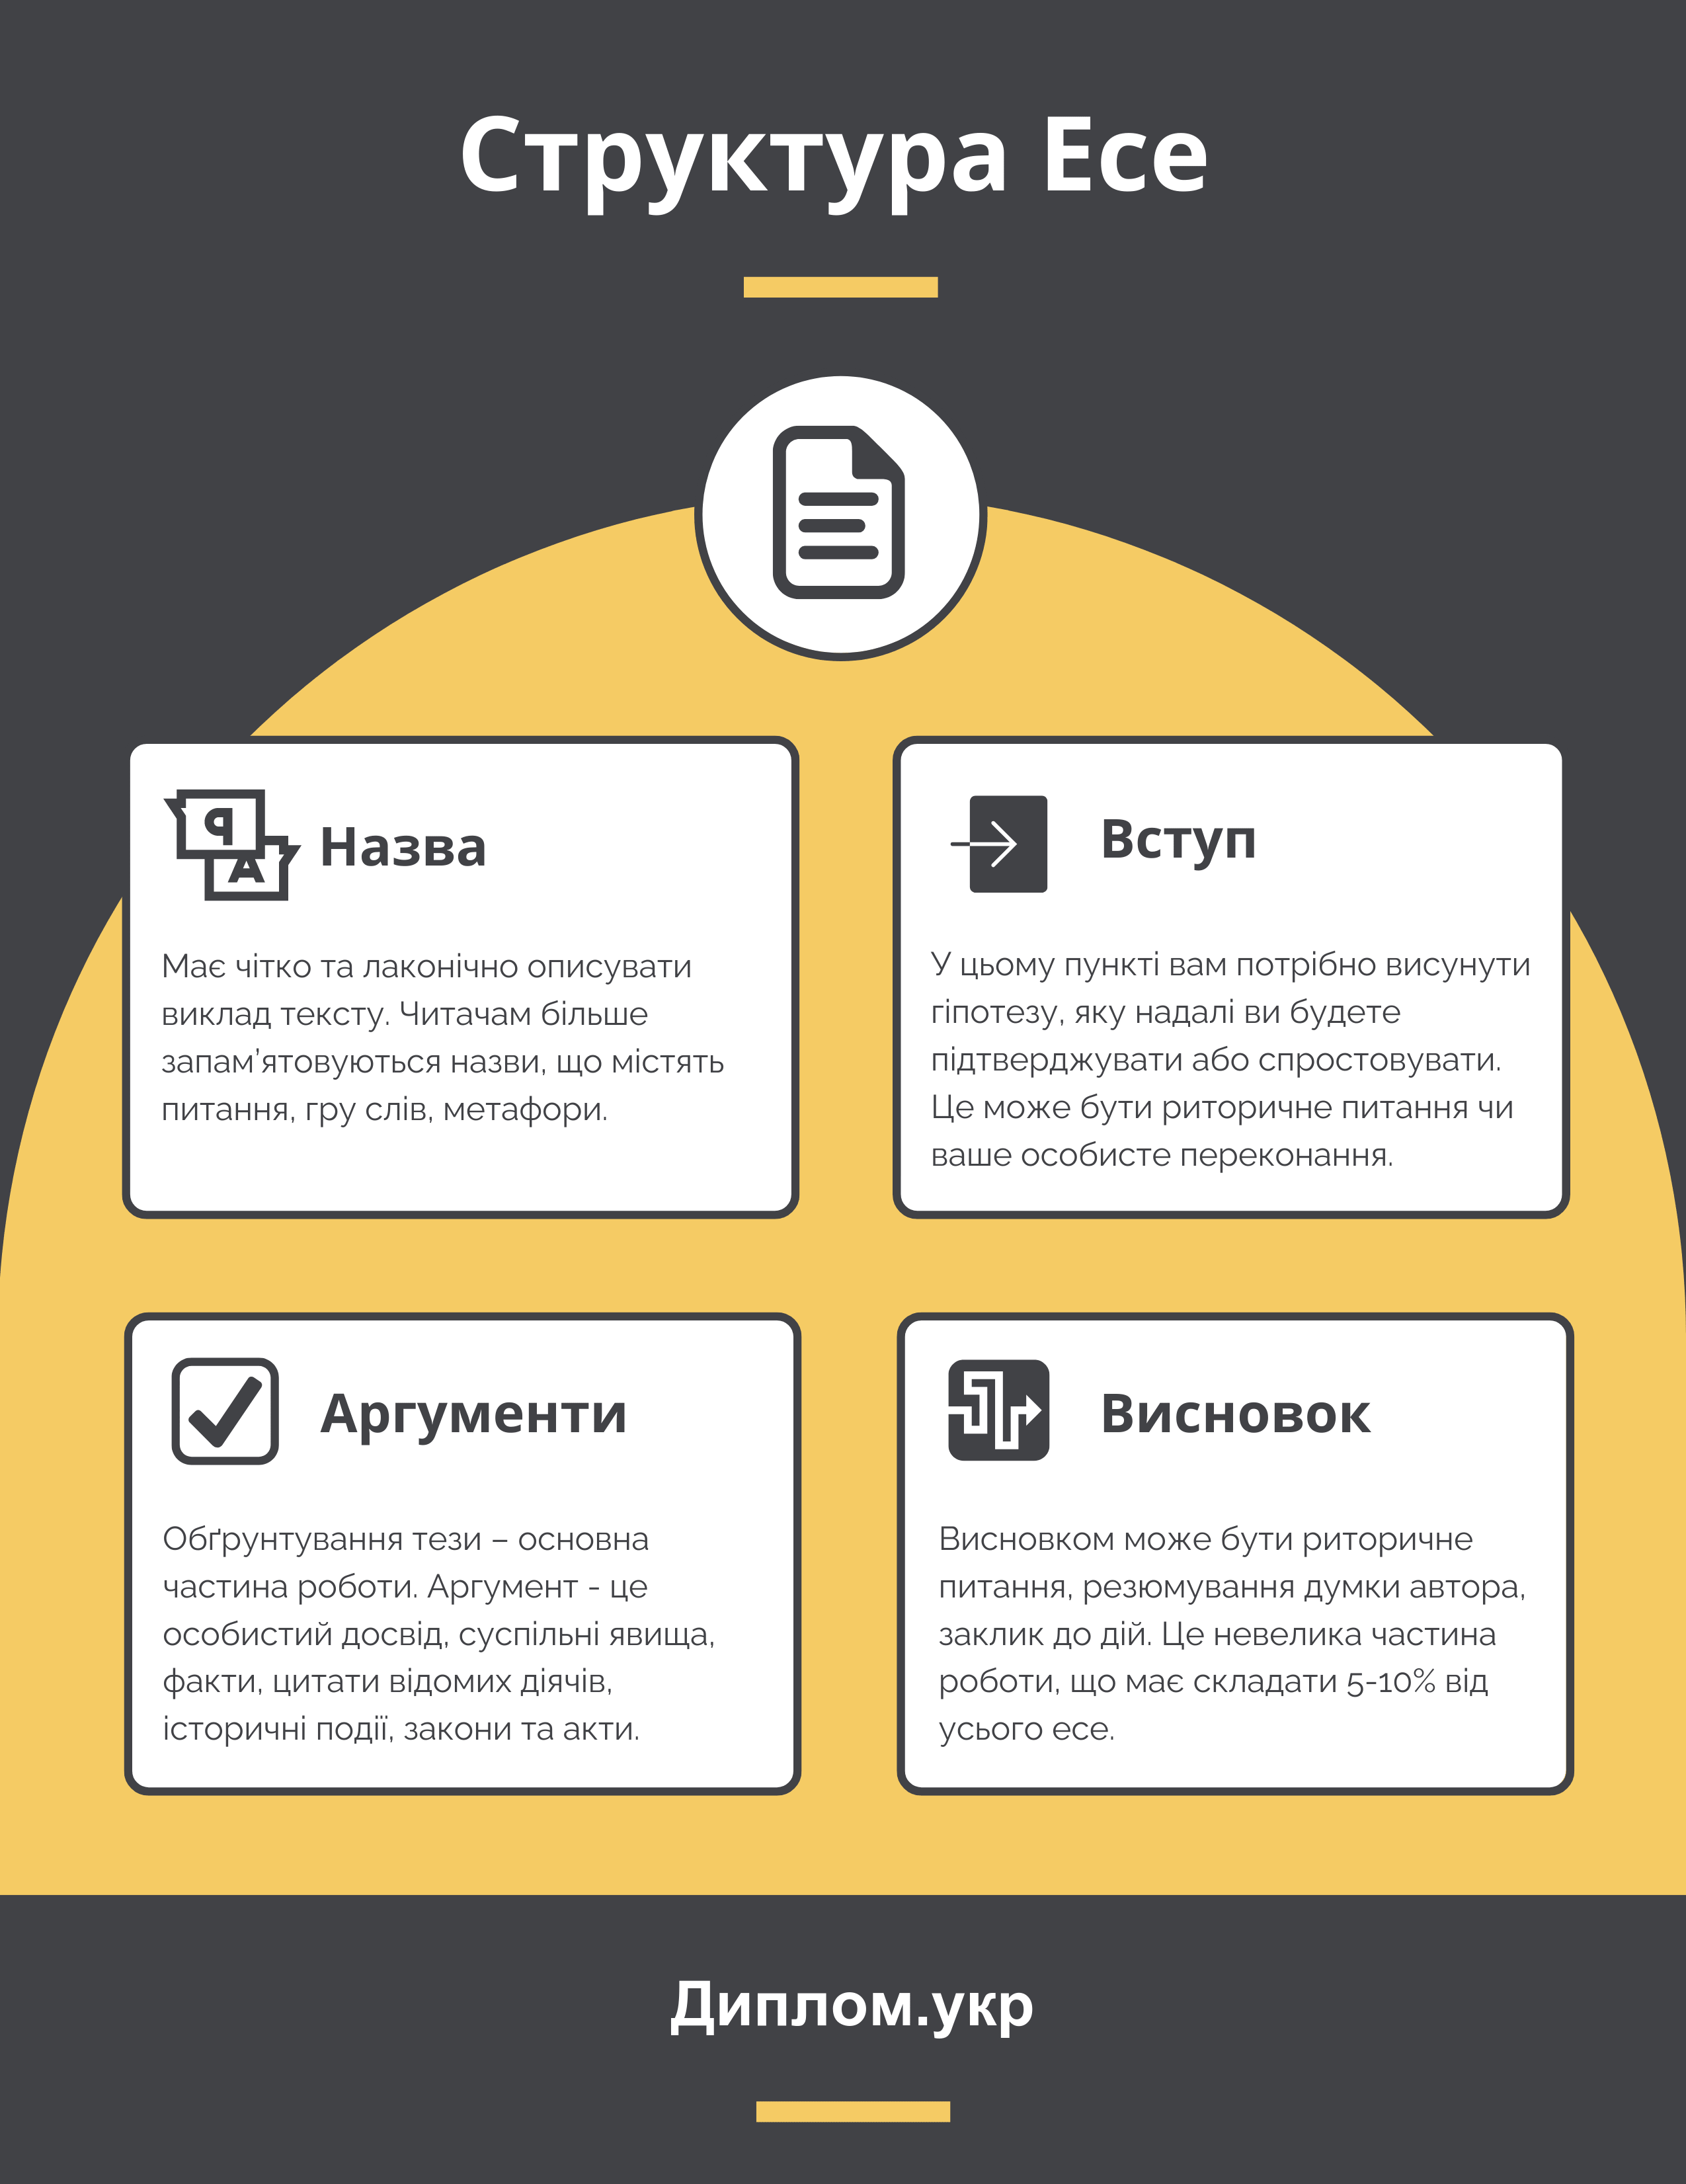 структура есе інфографіка